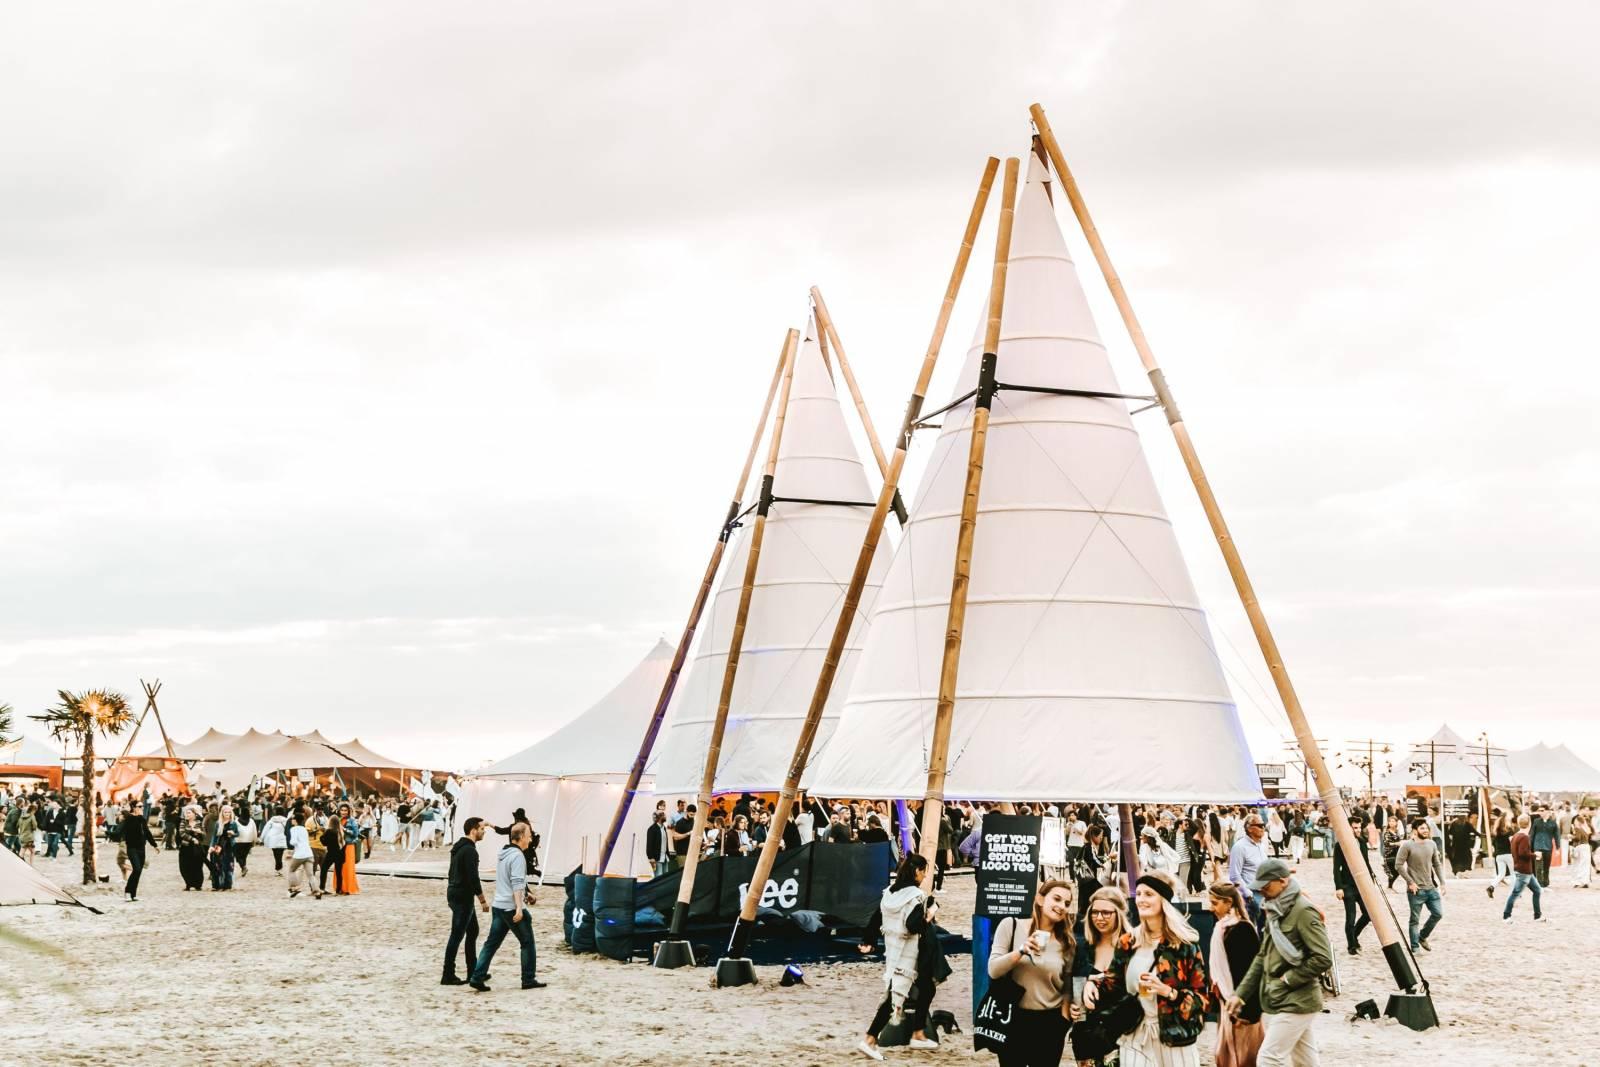 Organic-Concepts - Event Tenten - Feesttenten - Verhuur tenten - Bamboo Tipi - House of Events